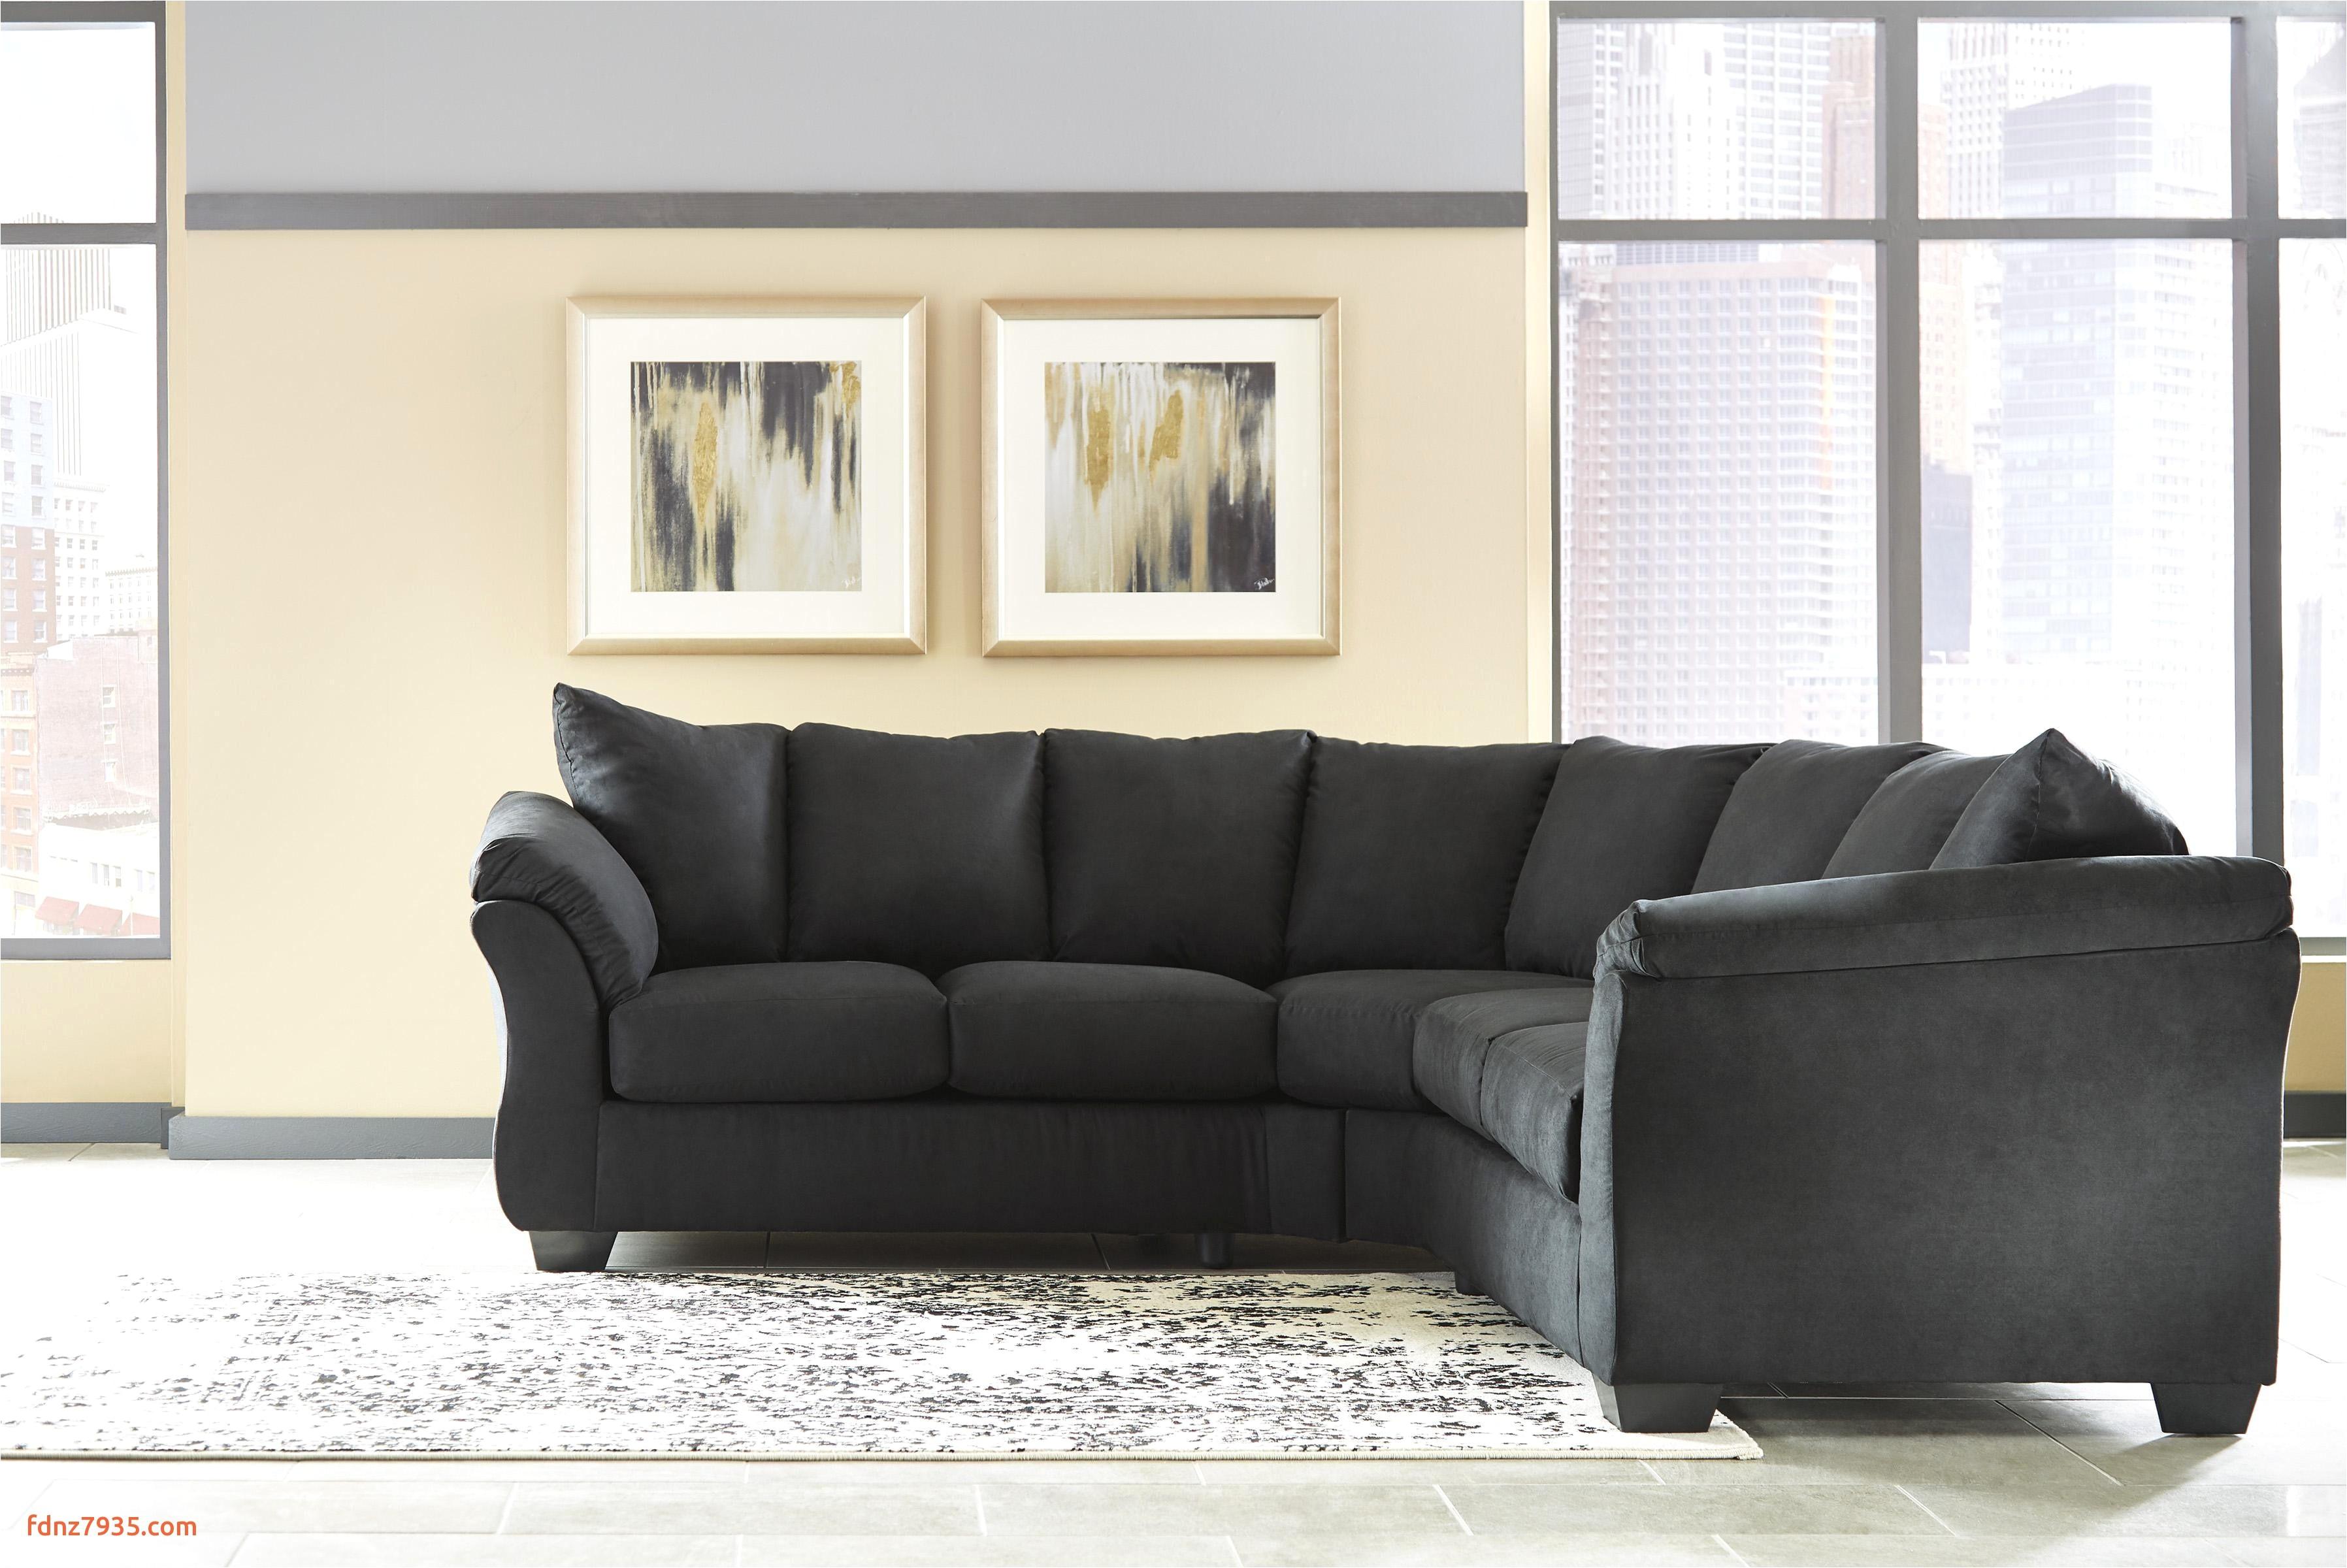 Modern Italian Sectional sofa Italian Sectional sofa Fresh sofa Design